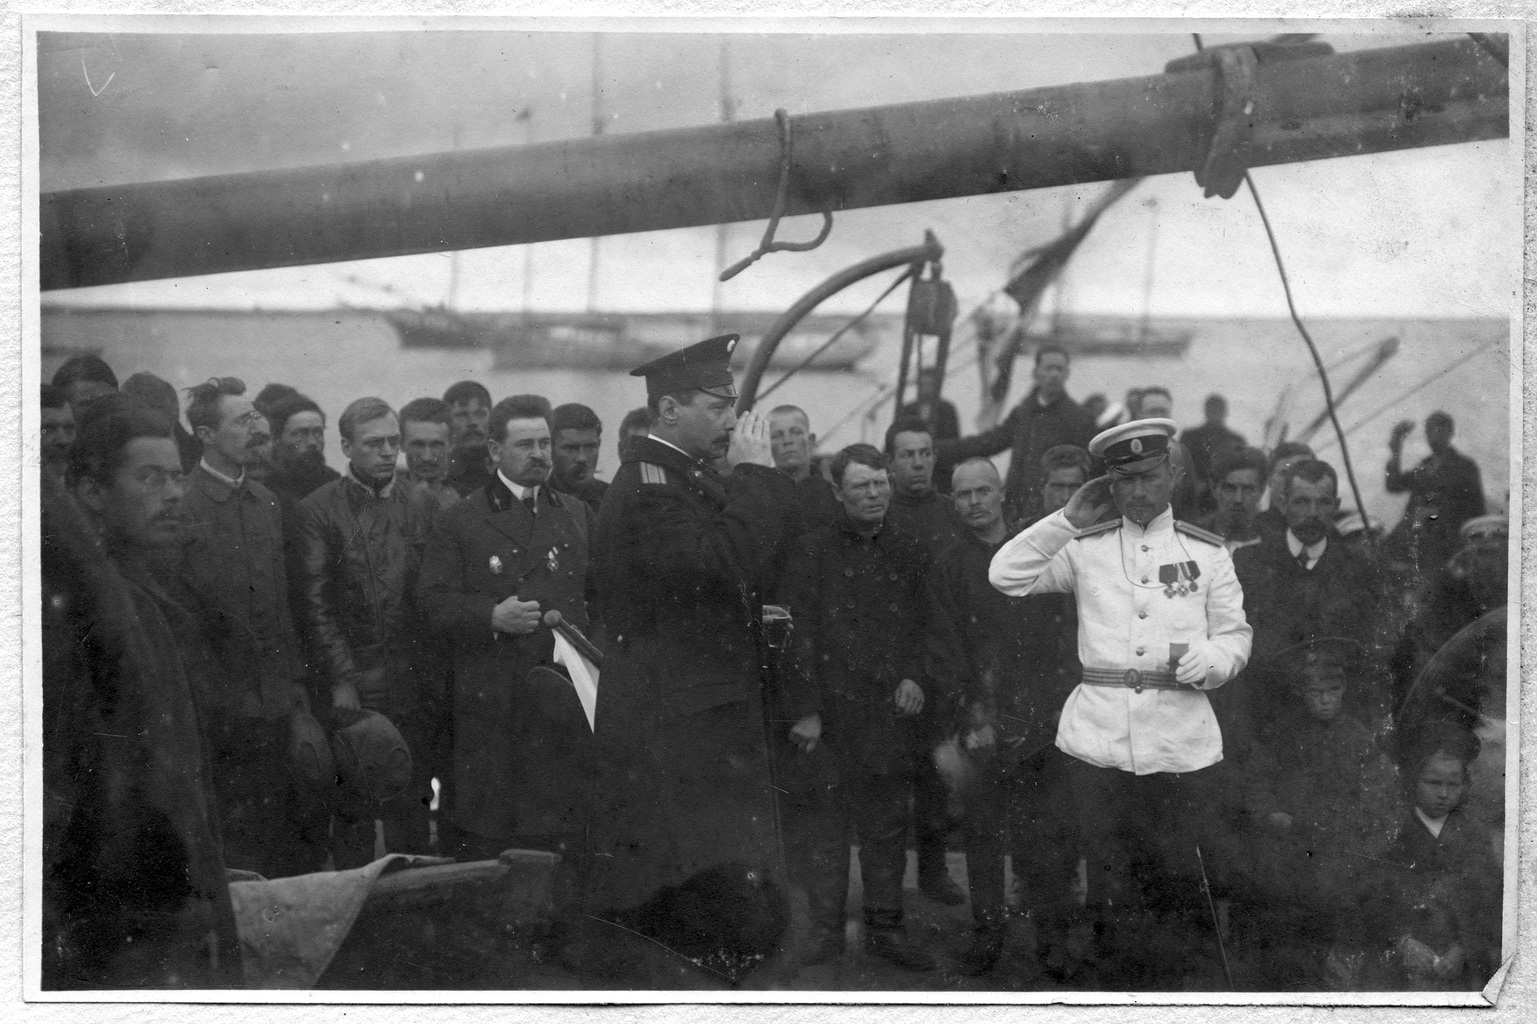 Седов Г. Я. на палубе судна «Святой мученик Фока» с участниками экспедиции